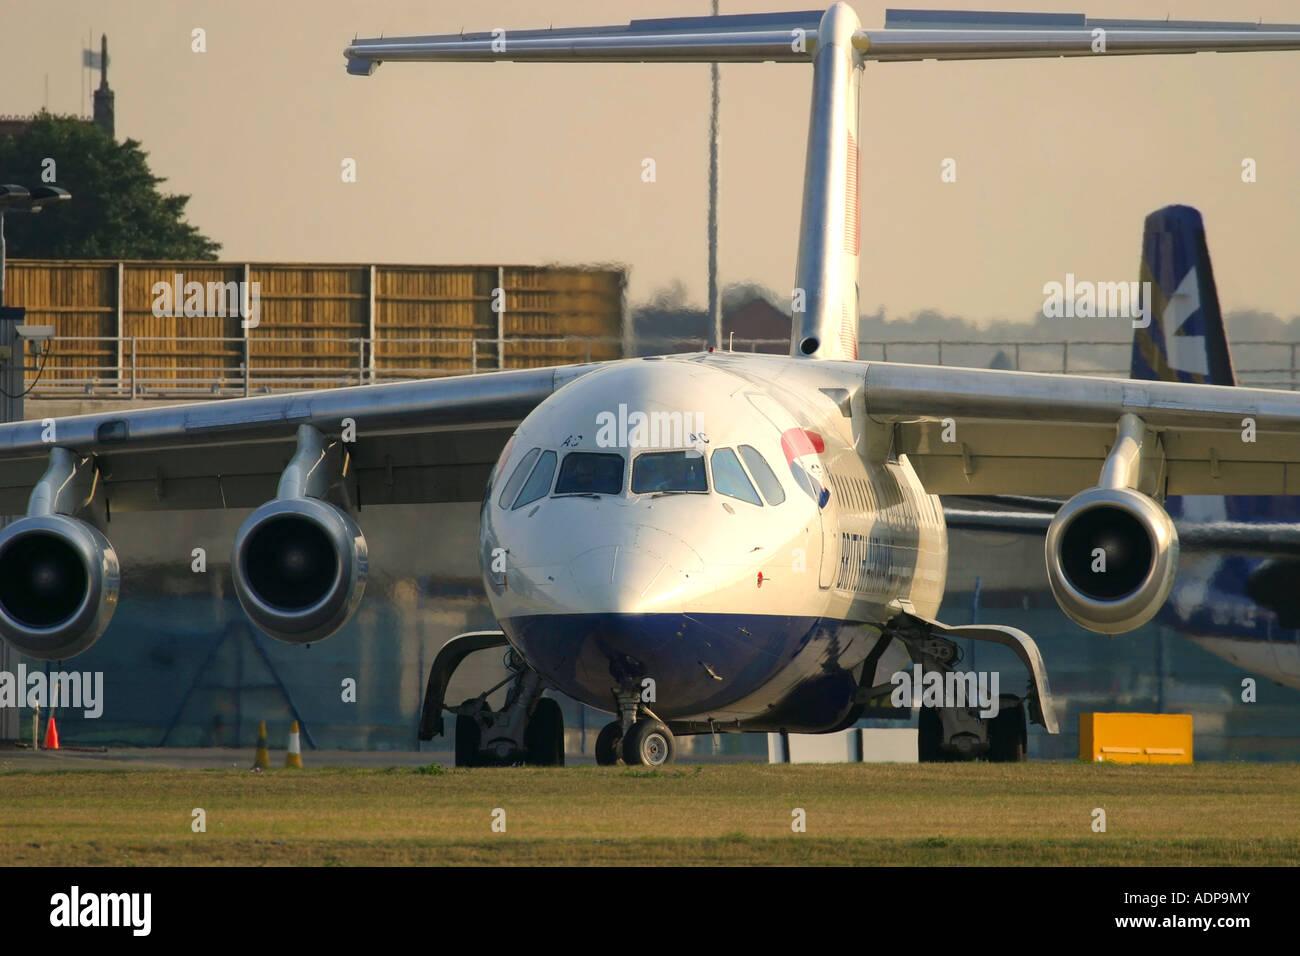 British Airways regional plane - Stock Image